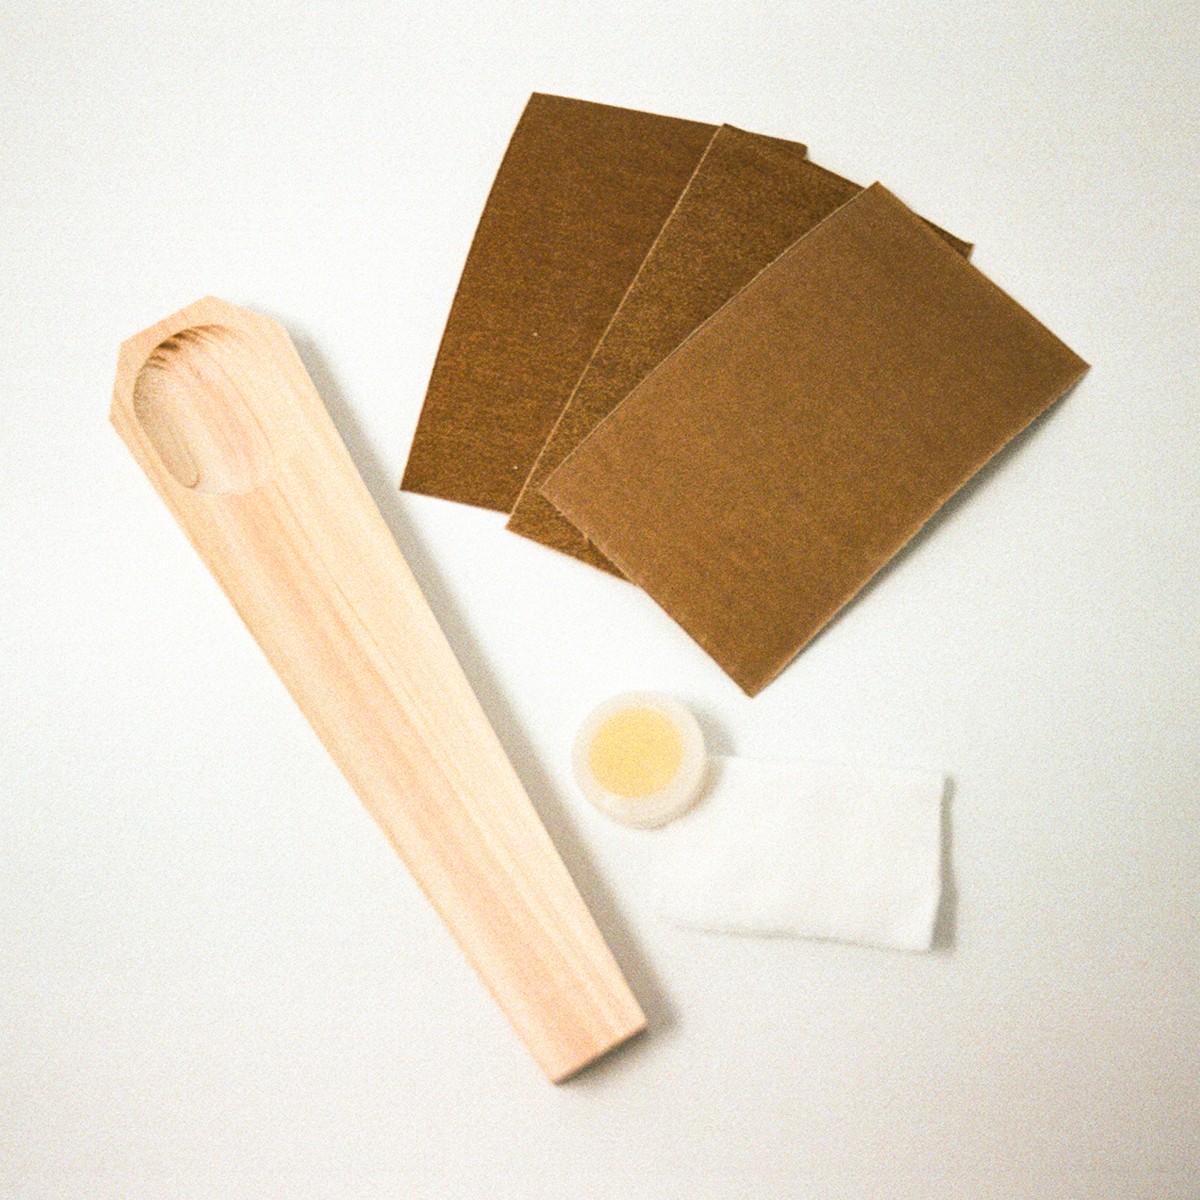 Photo of Japanese Spoon Whittling Kit